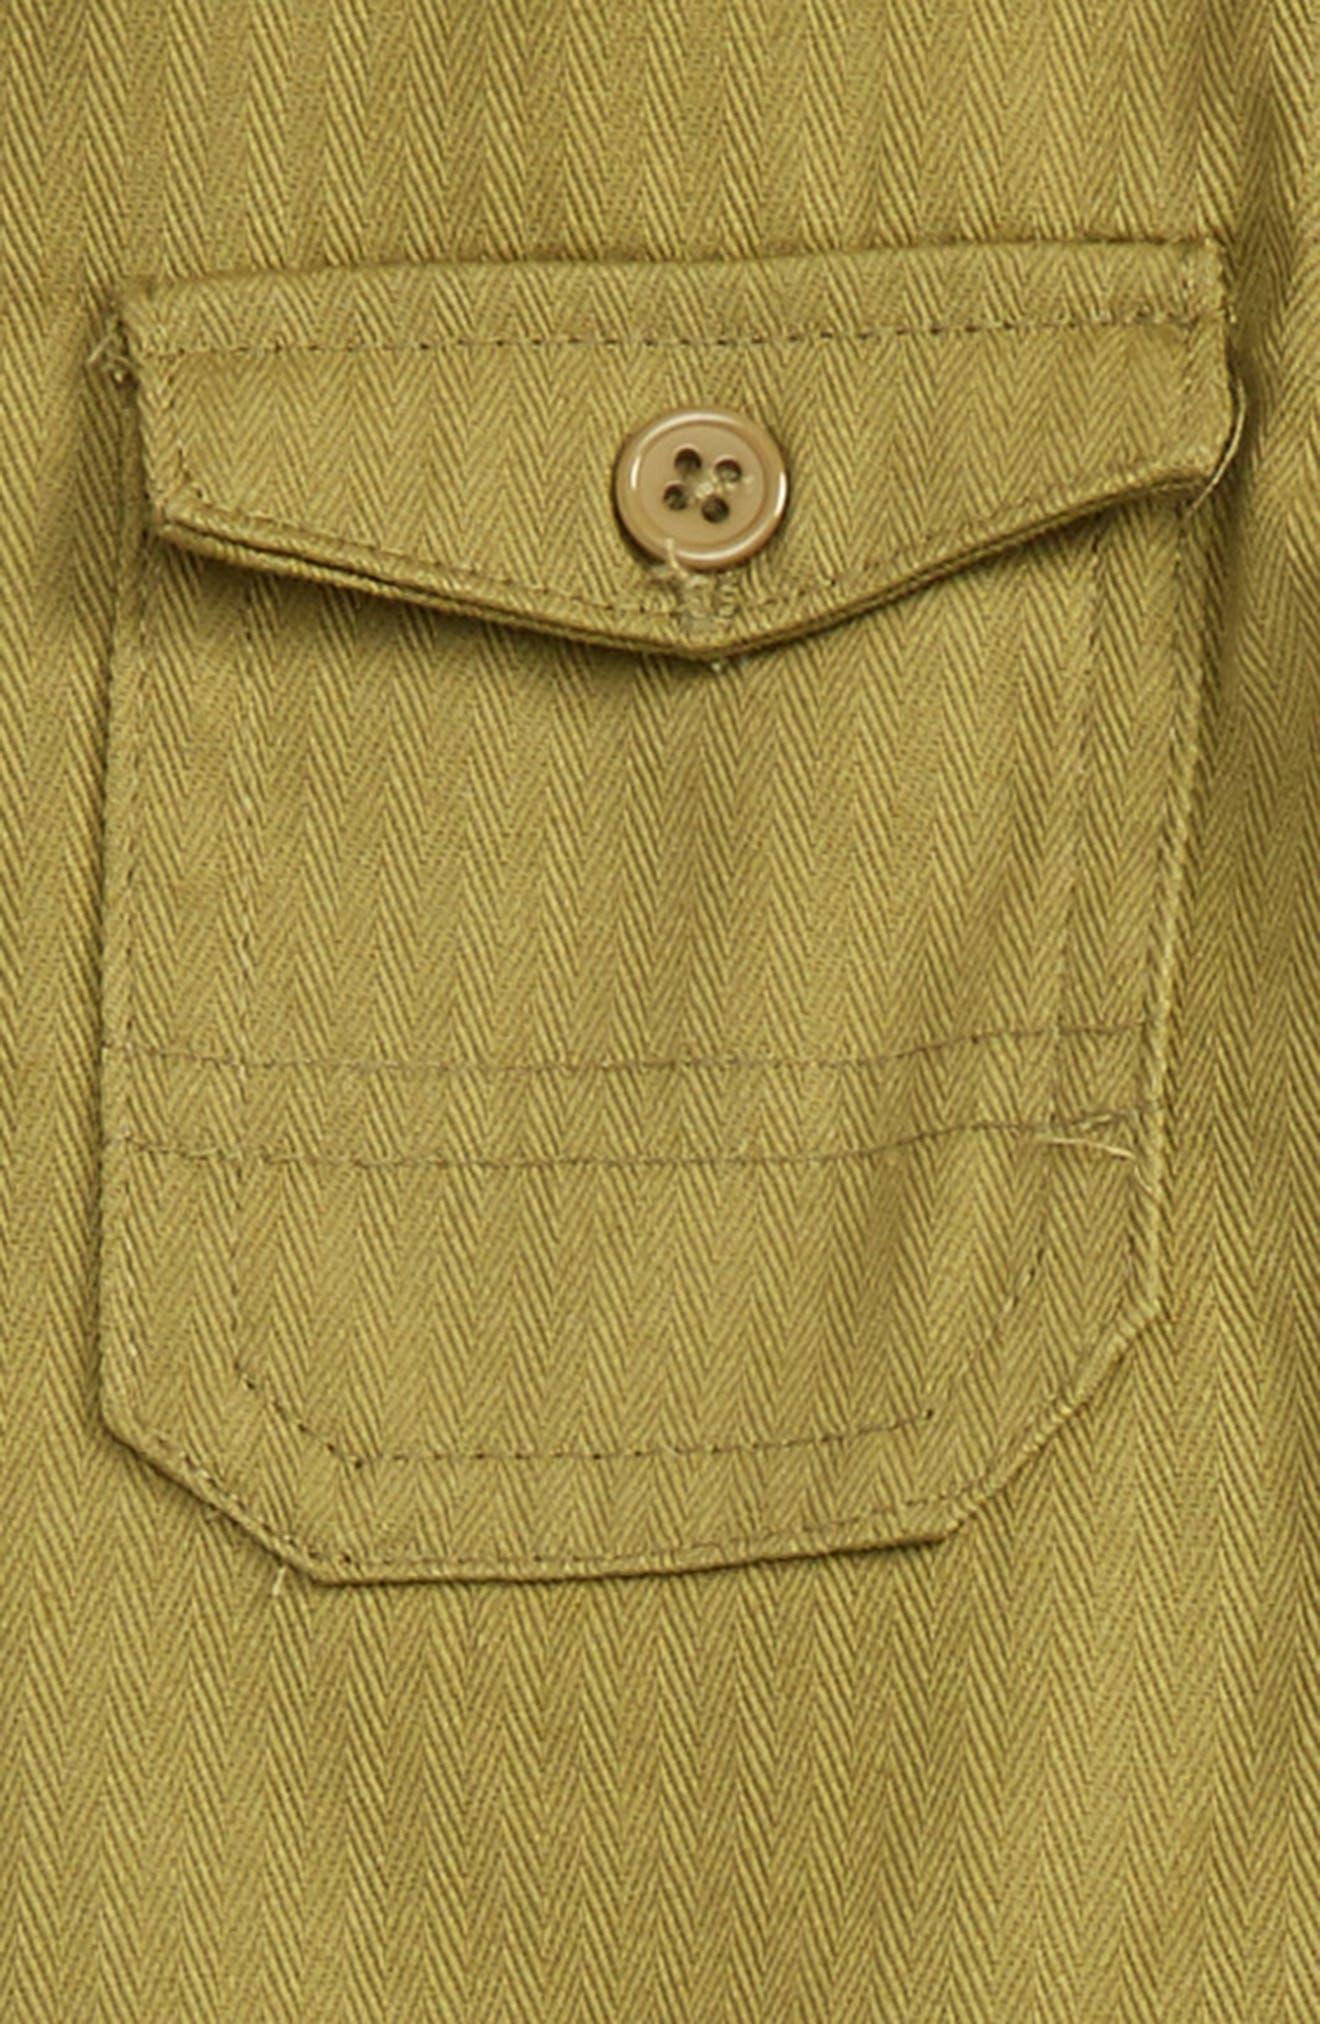 Woven Shirt & Sweatpants Set,                             Alternate thumbnail 2, color,                             311